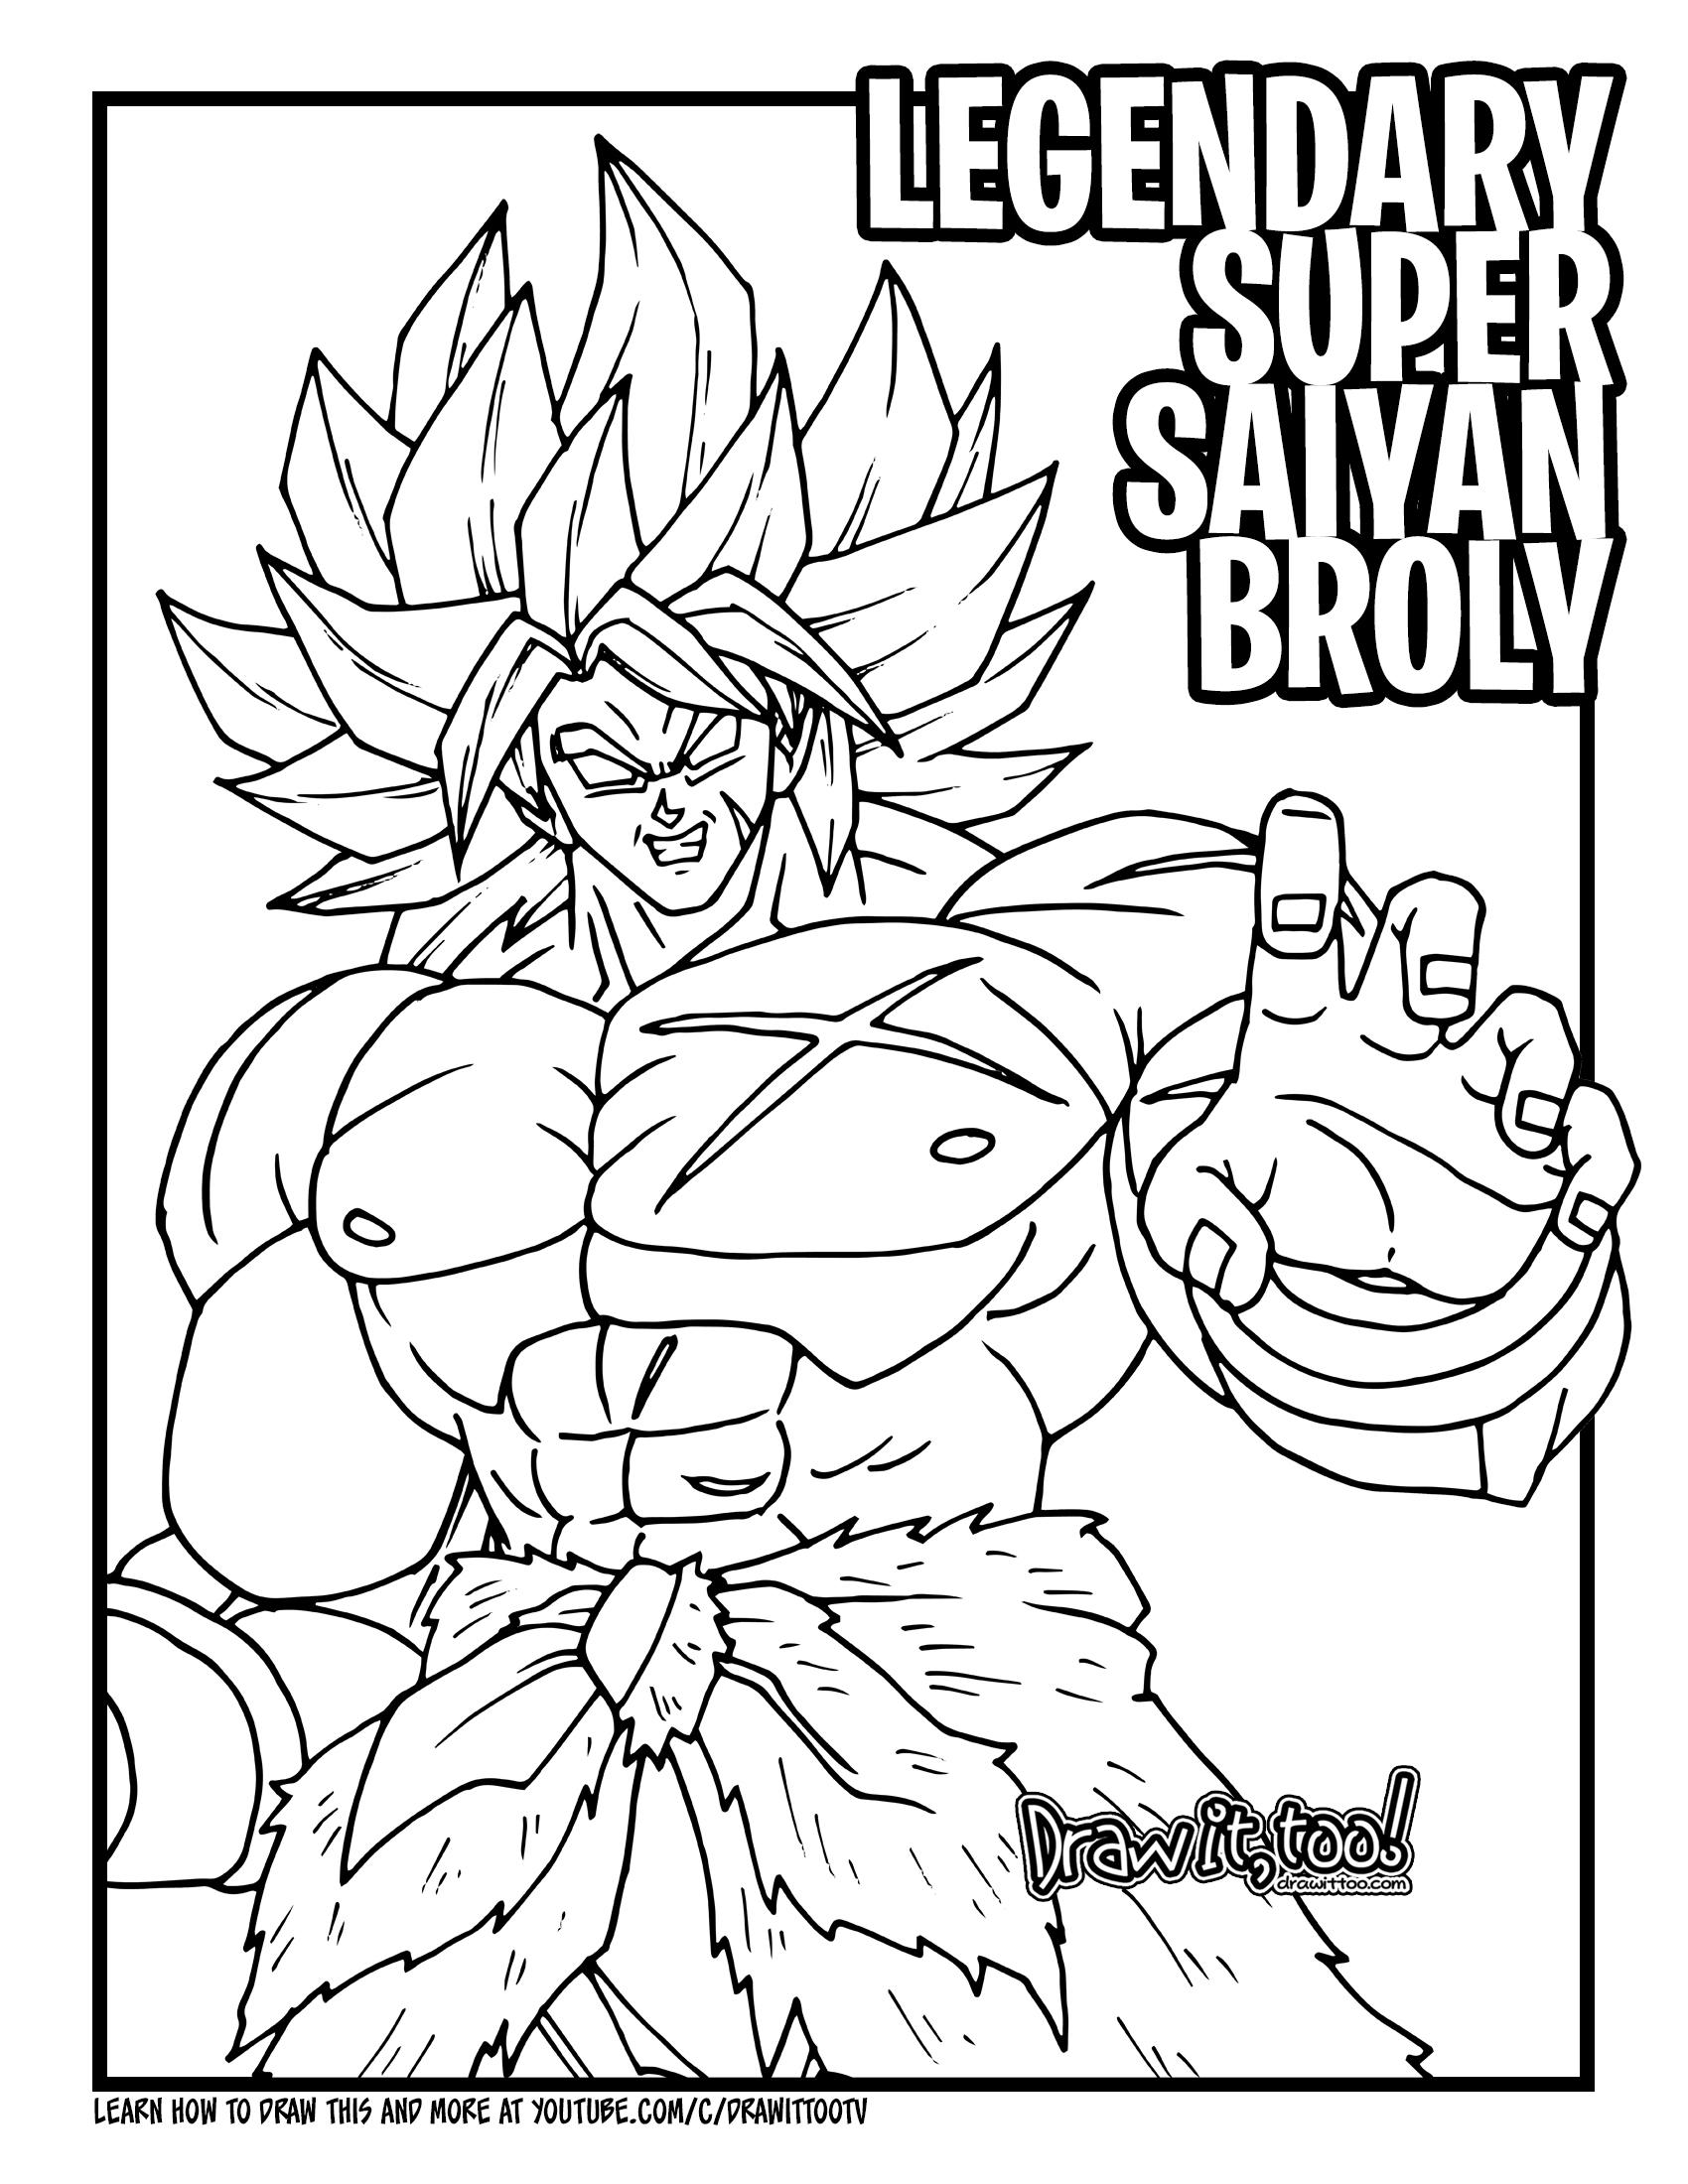 How to Draw LEGENDARY SUPER SAIYAN BROLY (Dragon Ball ...